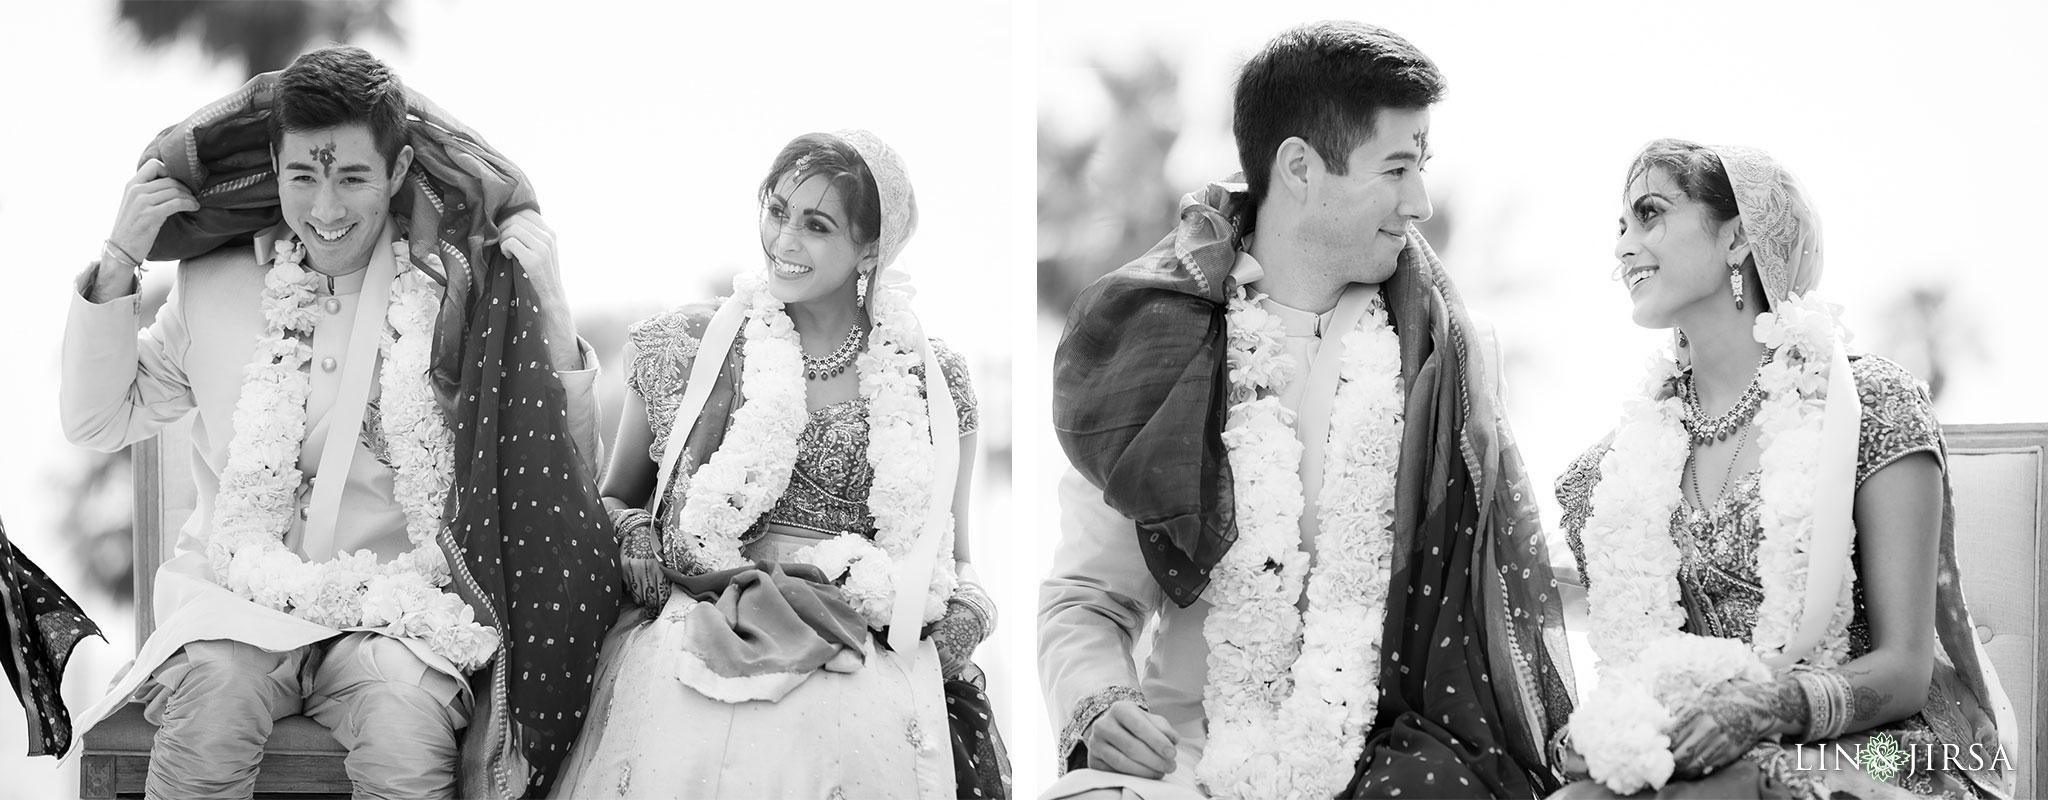 31 pasea hotel and spa huntington beach indian wedding ceremony photography